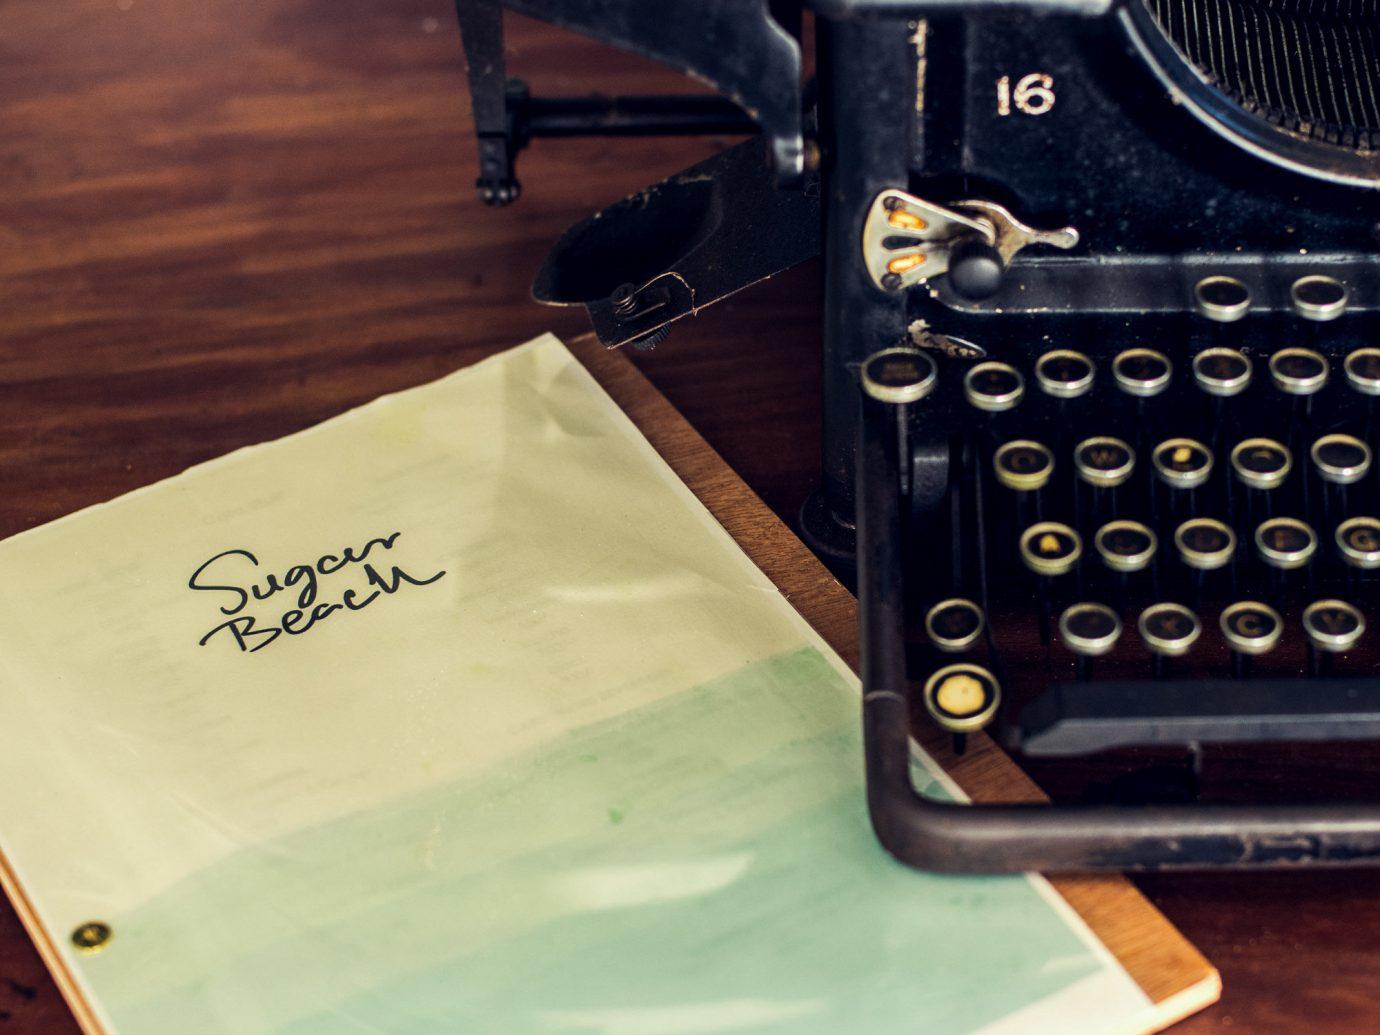 typewriter office supplies office equipment font